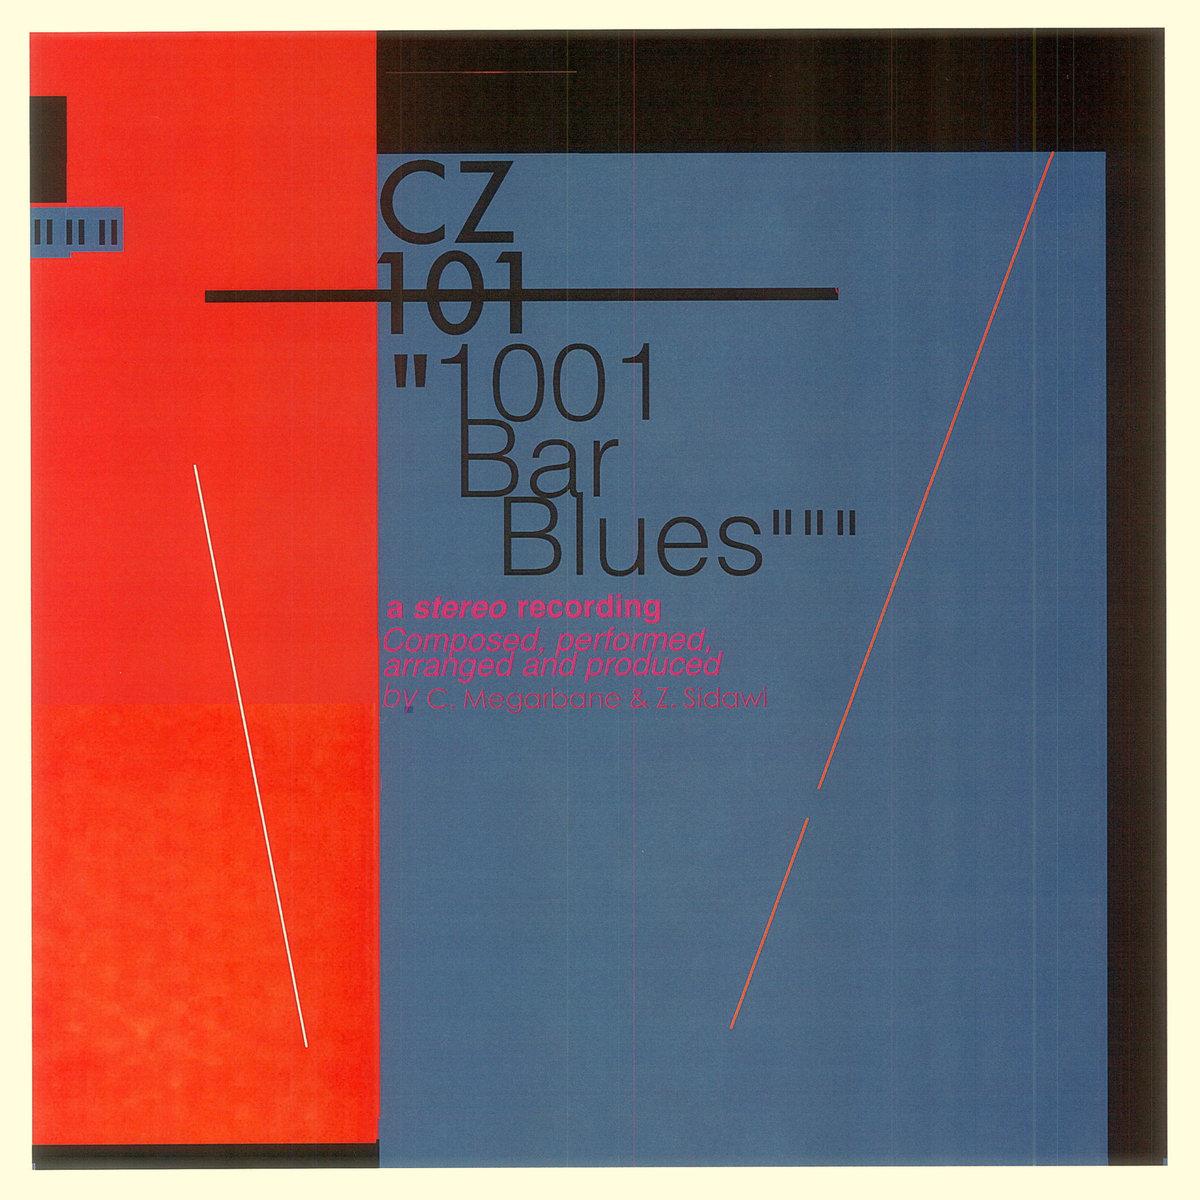 1001 Bar Blues Album